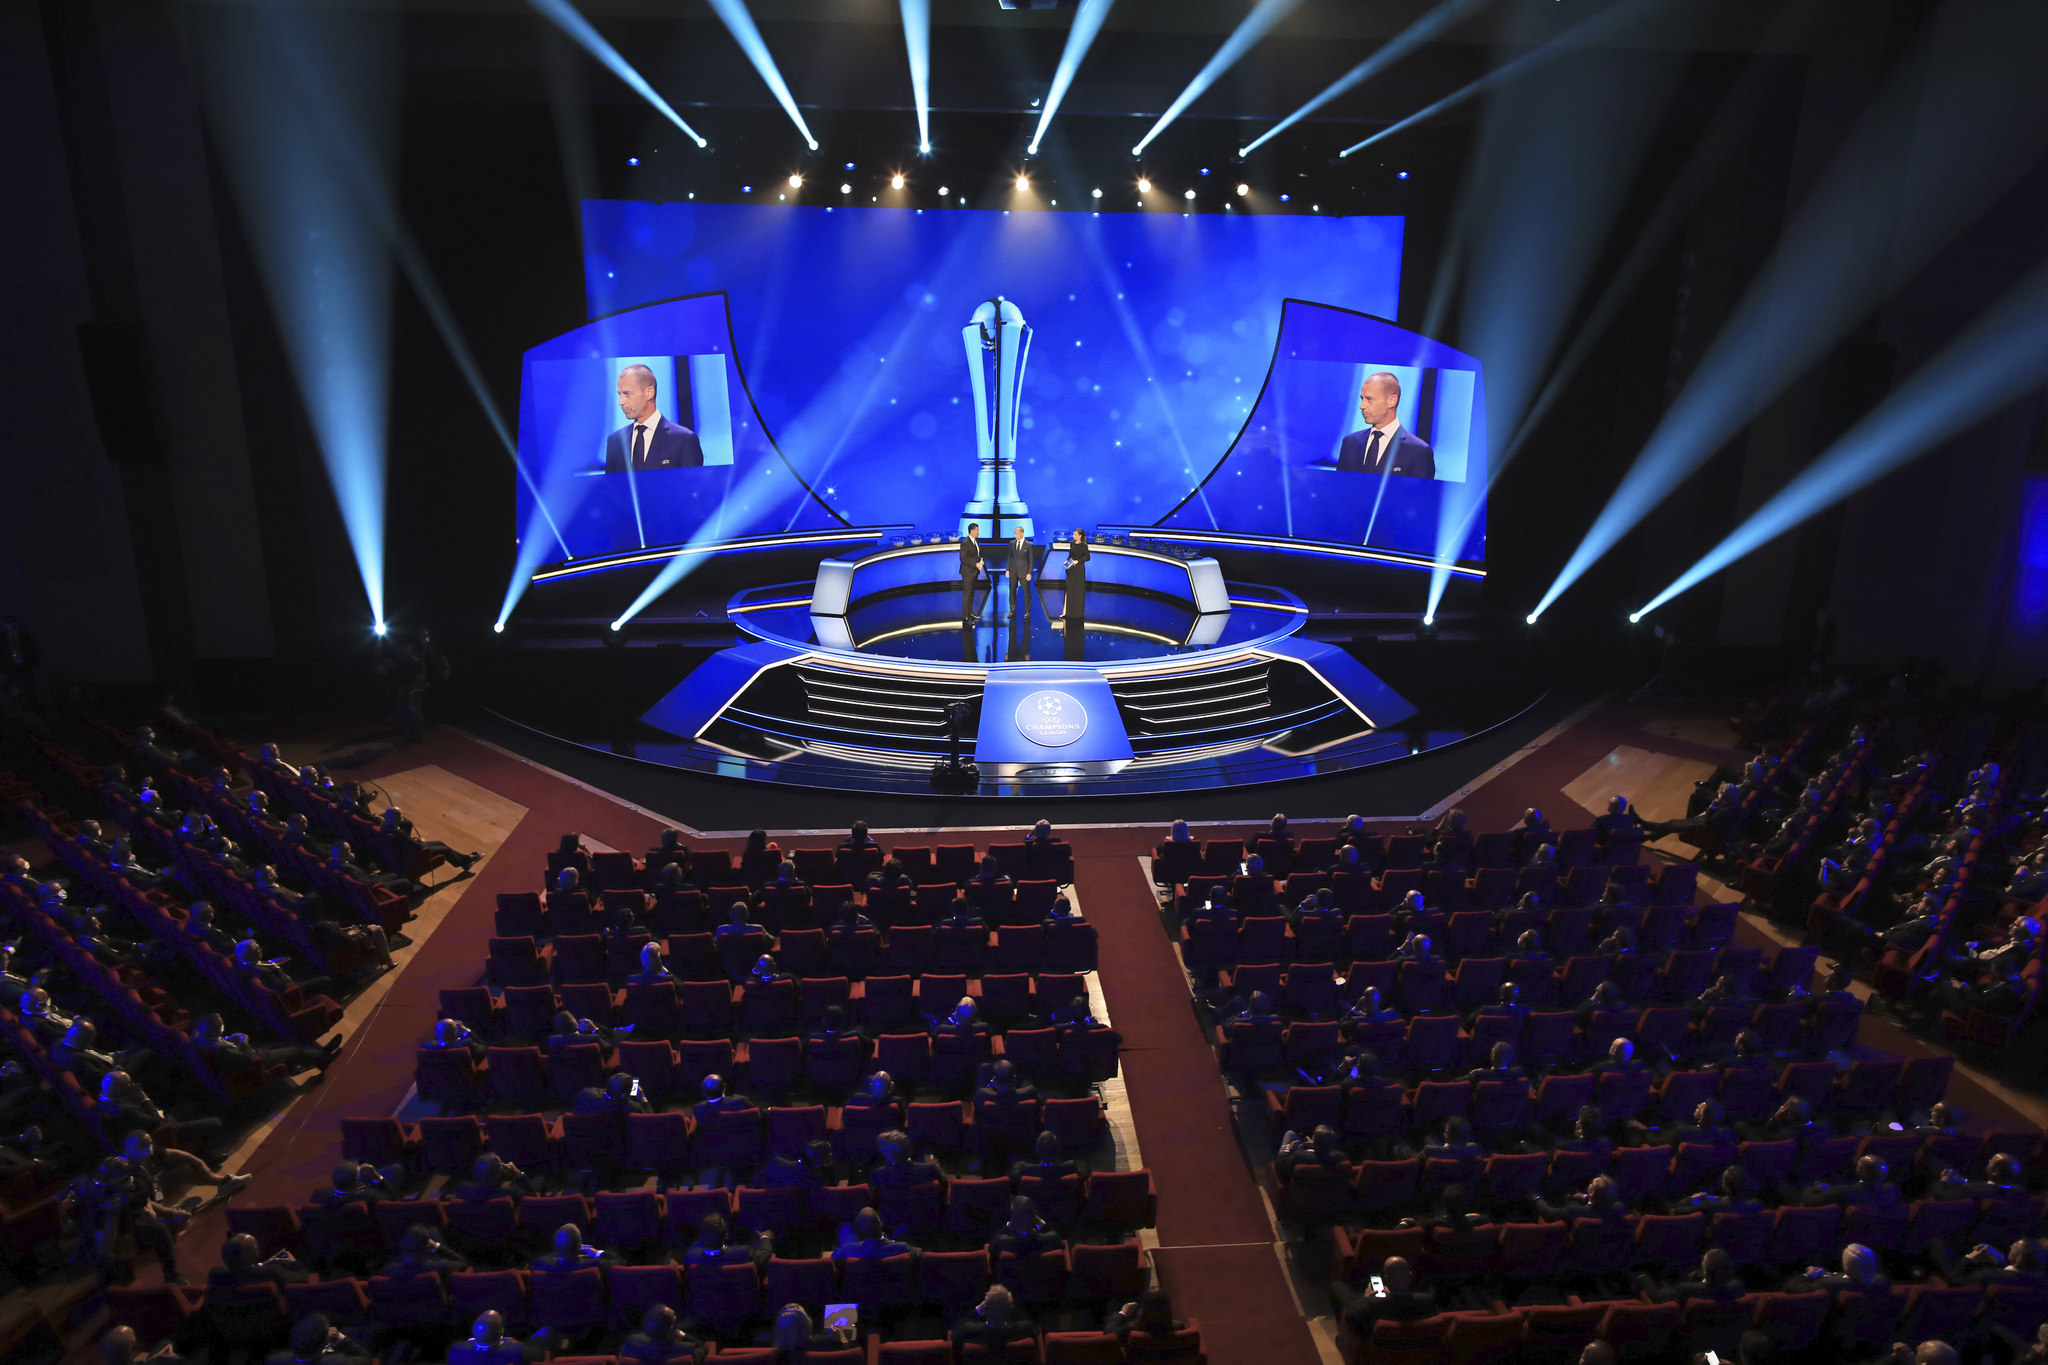 UEFA President Aleksander Ceferin, center, speaks during the soccer lt; HIT gt; Champions lt; / HIT gt; League draw in Istanbul, Turkey, Thursday, Aug. 26, 2021. (AP Photo / Emrah Gurel)